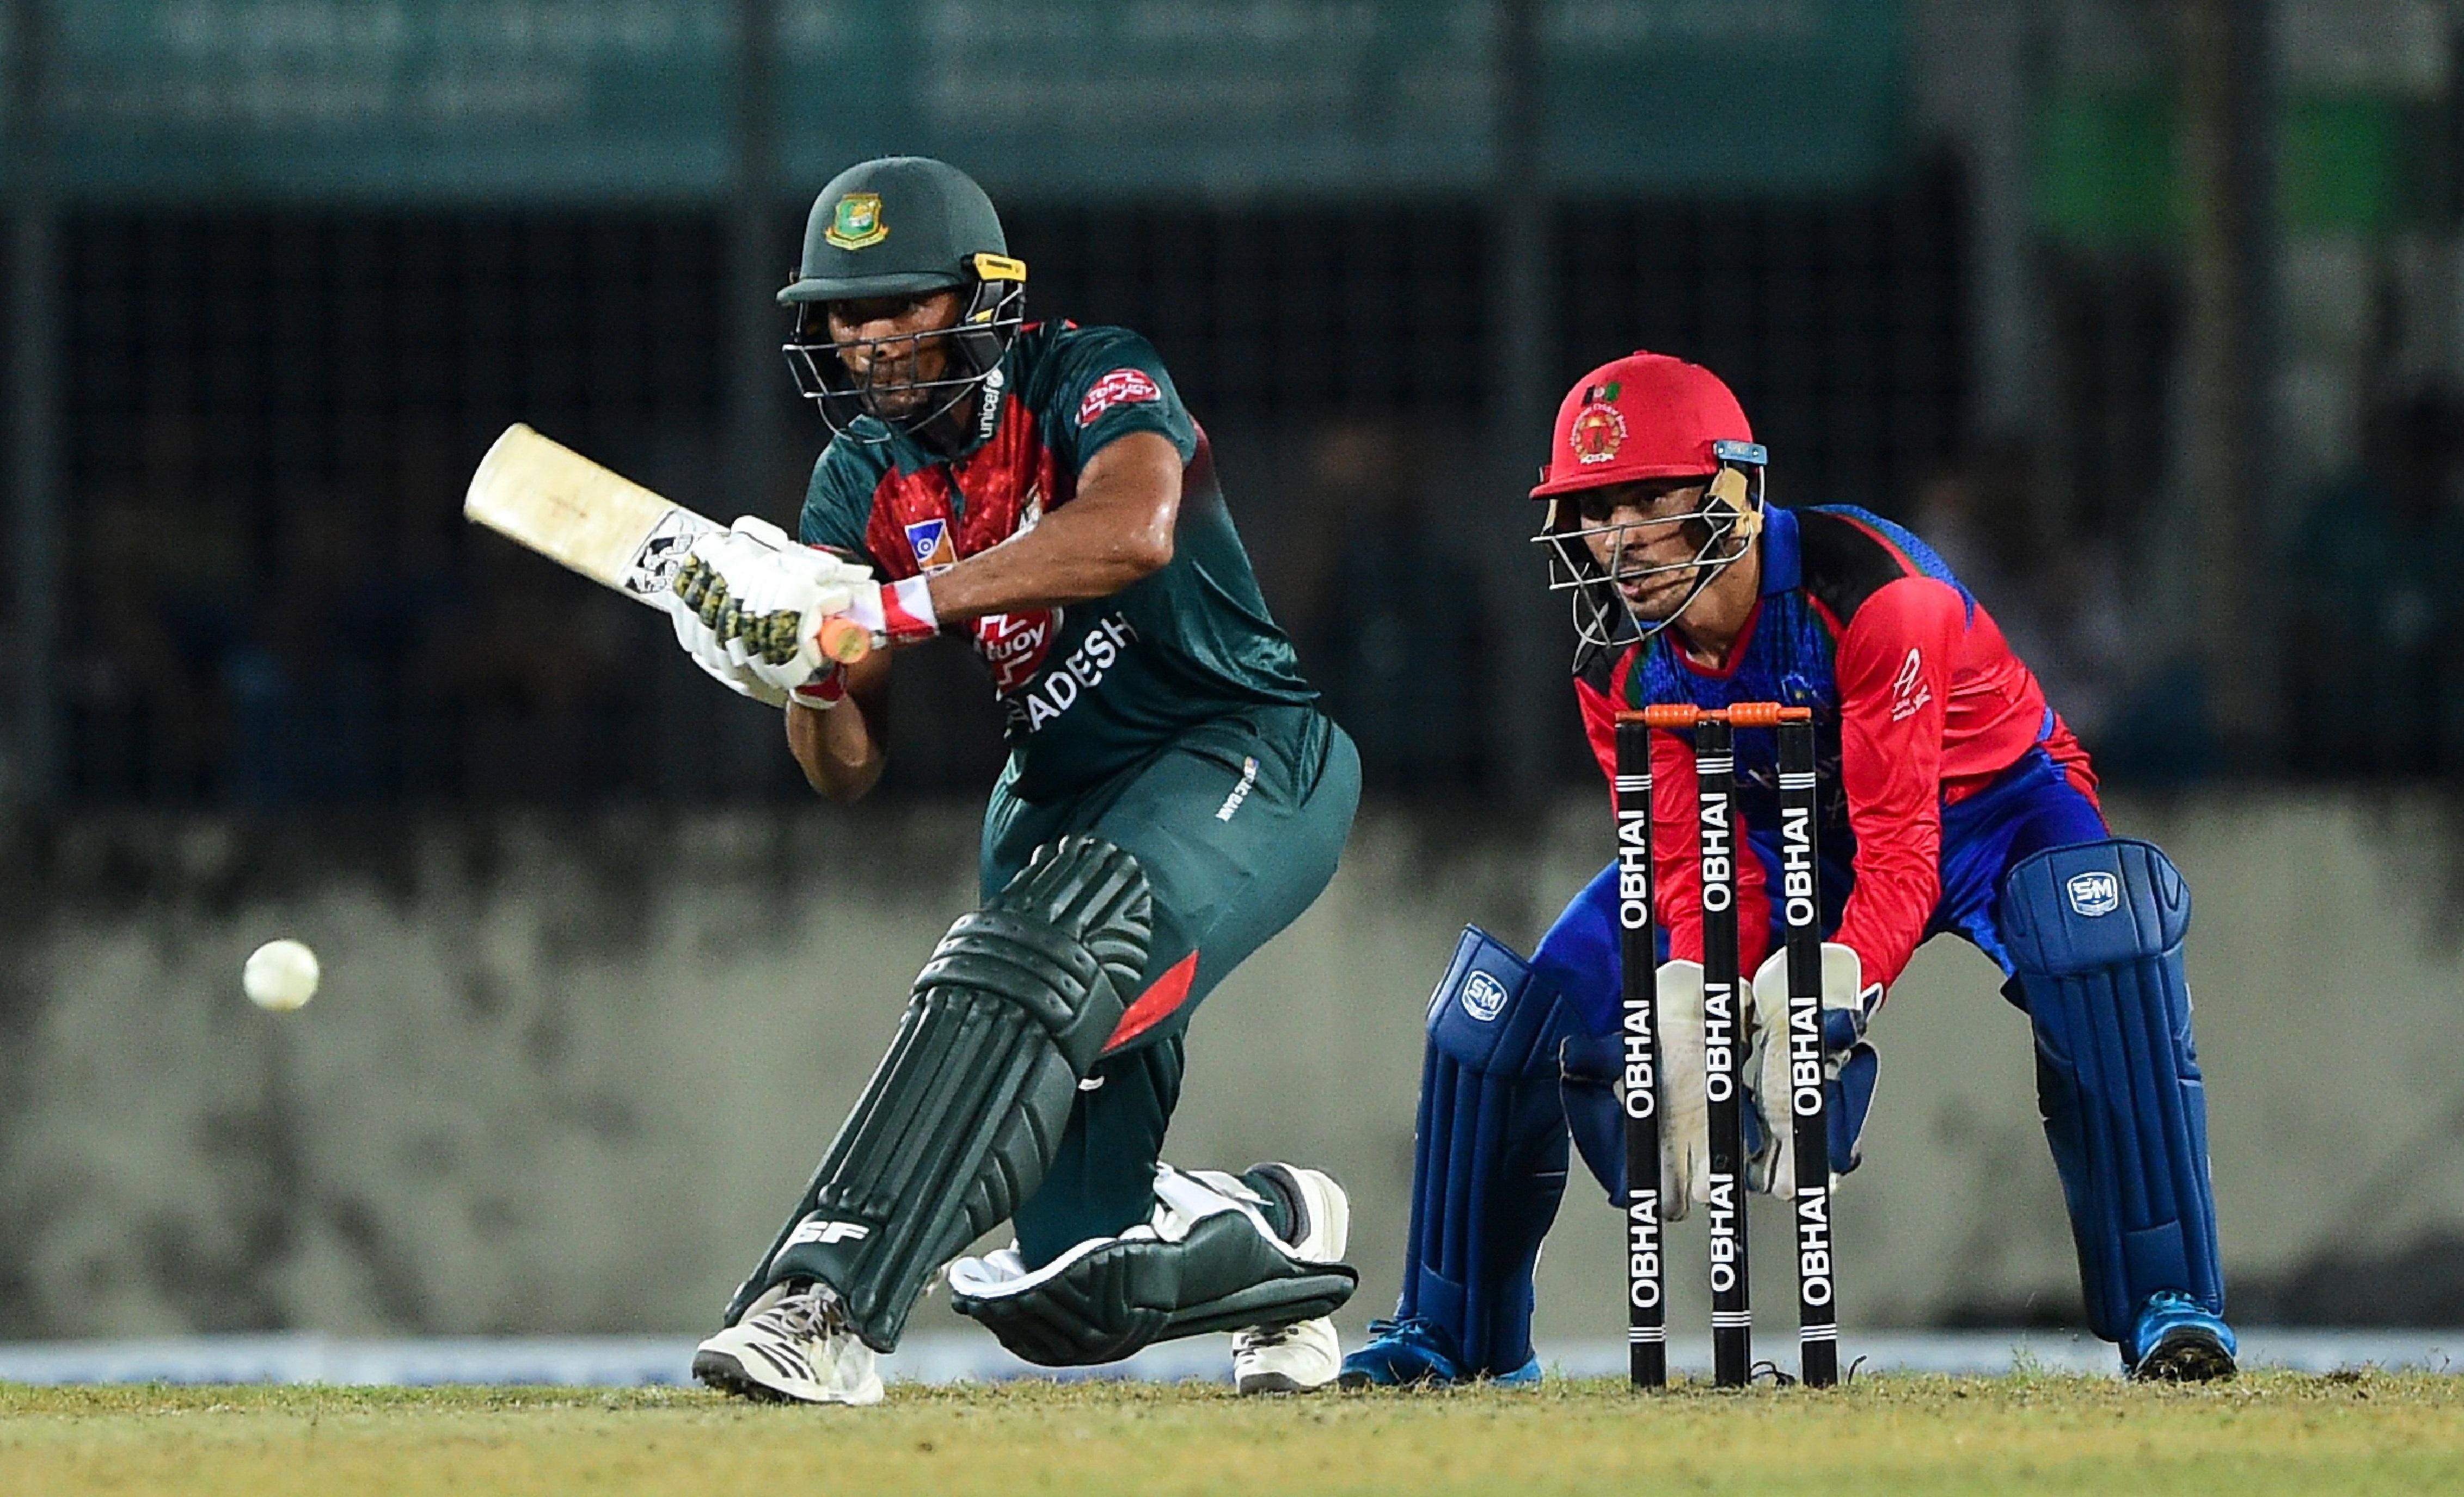 'Afghanistan are ranked higher than us' – Mahmudullah wants 'focus' in last leg of tri-series